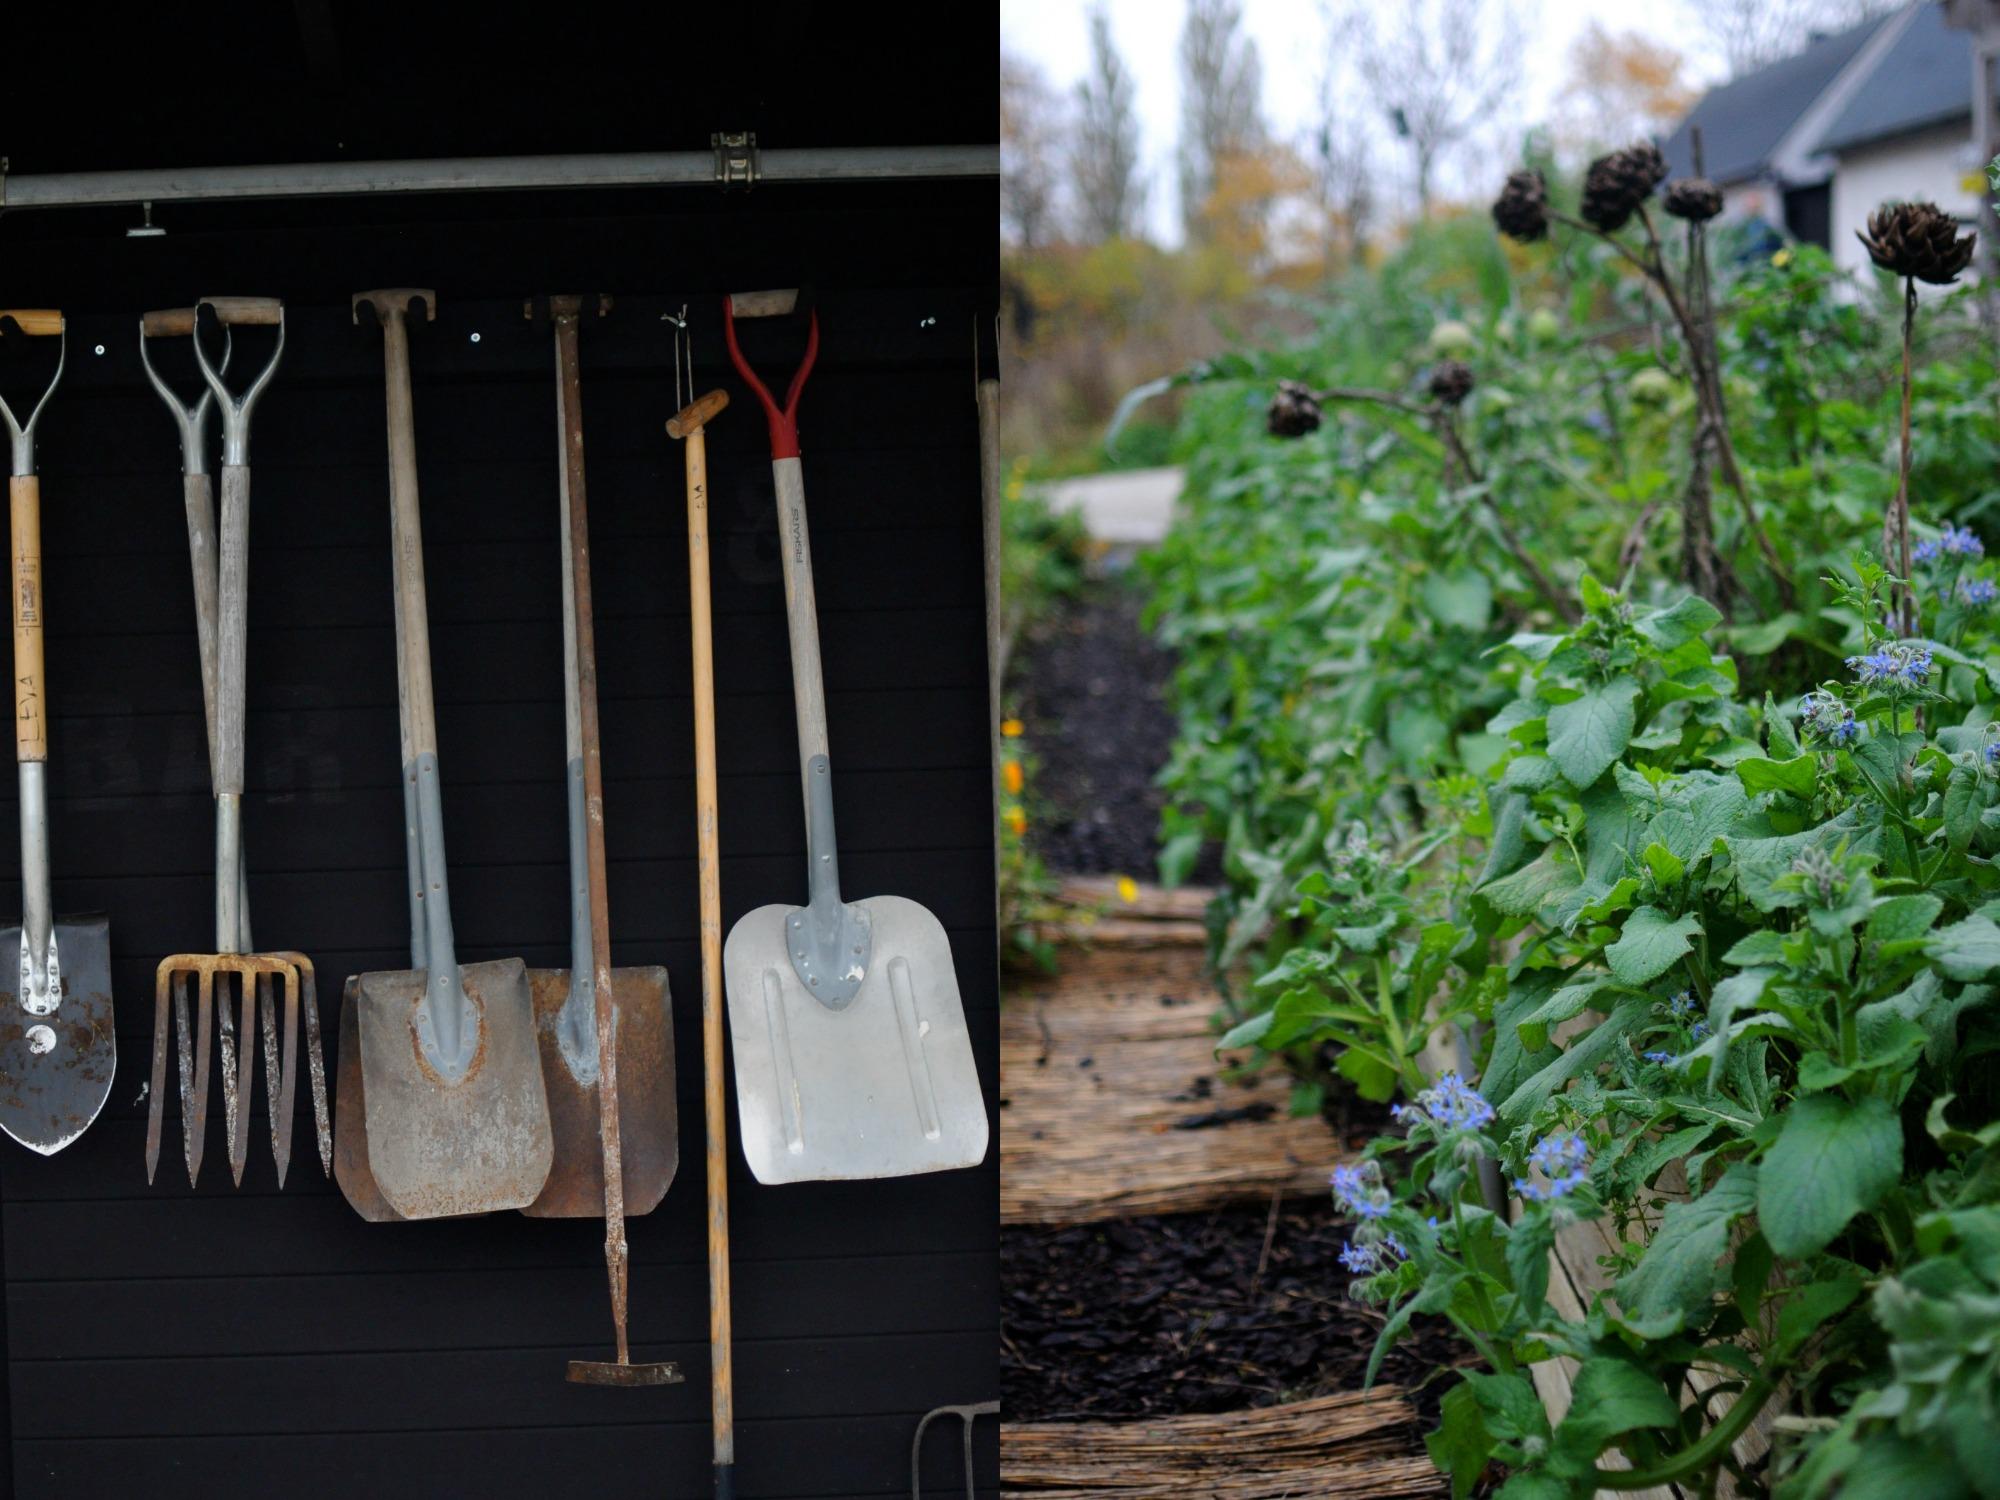 garden tools sweden gotland artichokes